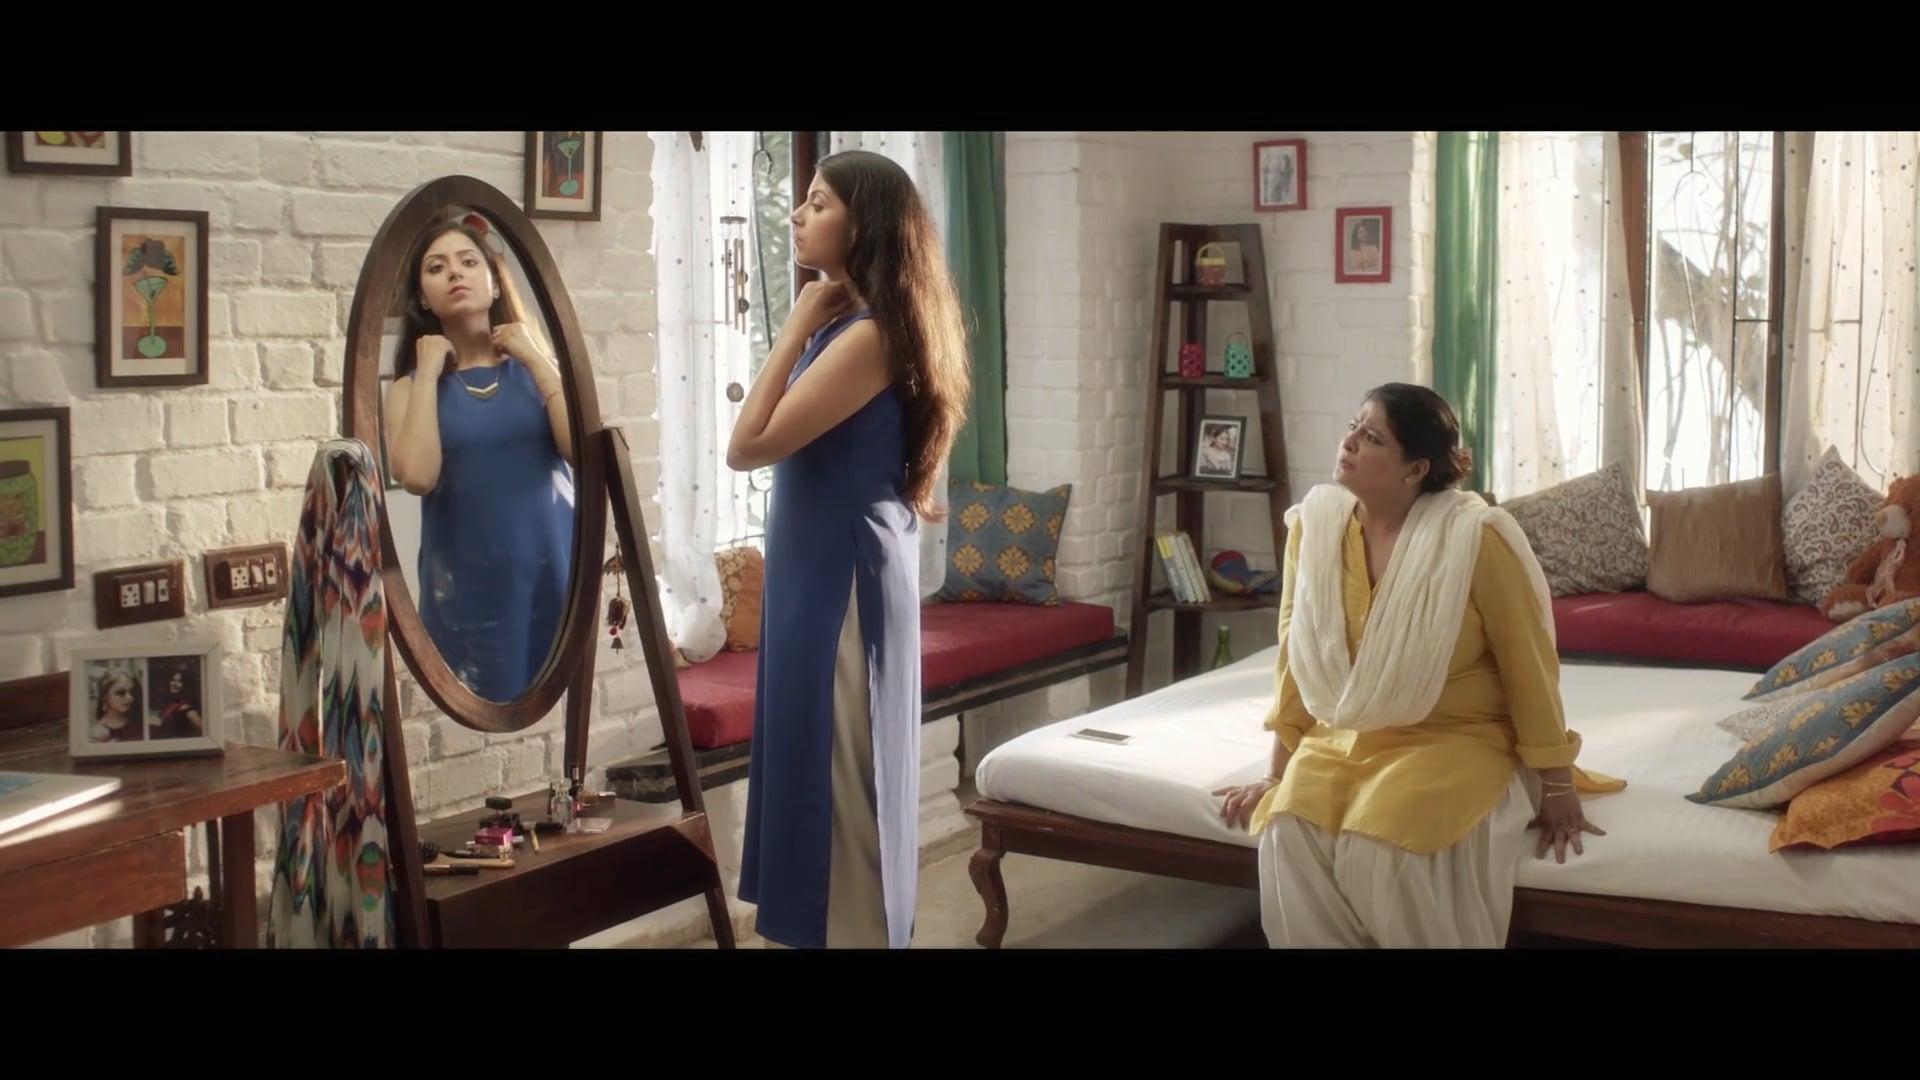 Tinder 'Mother's Day' Film